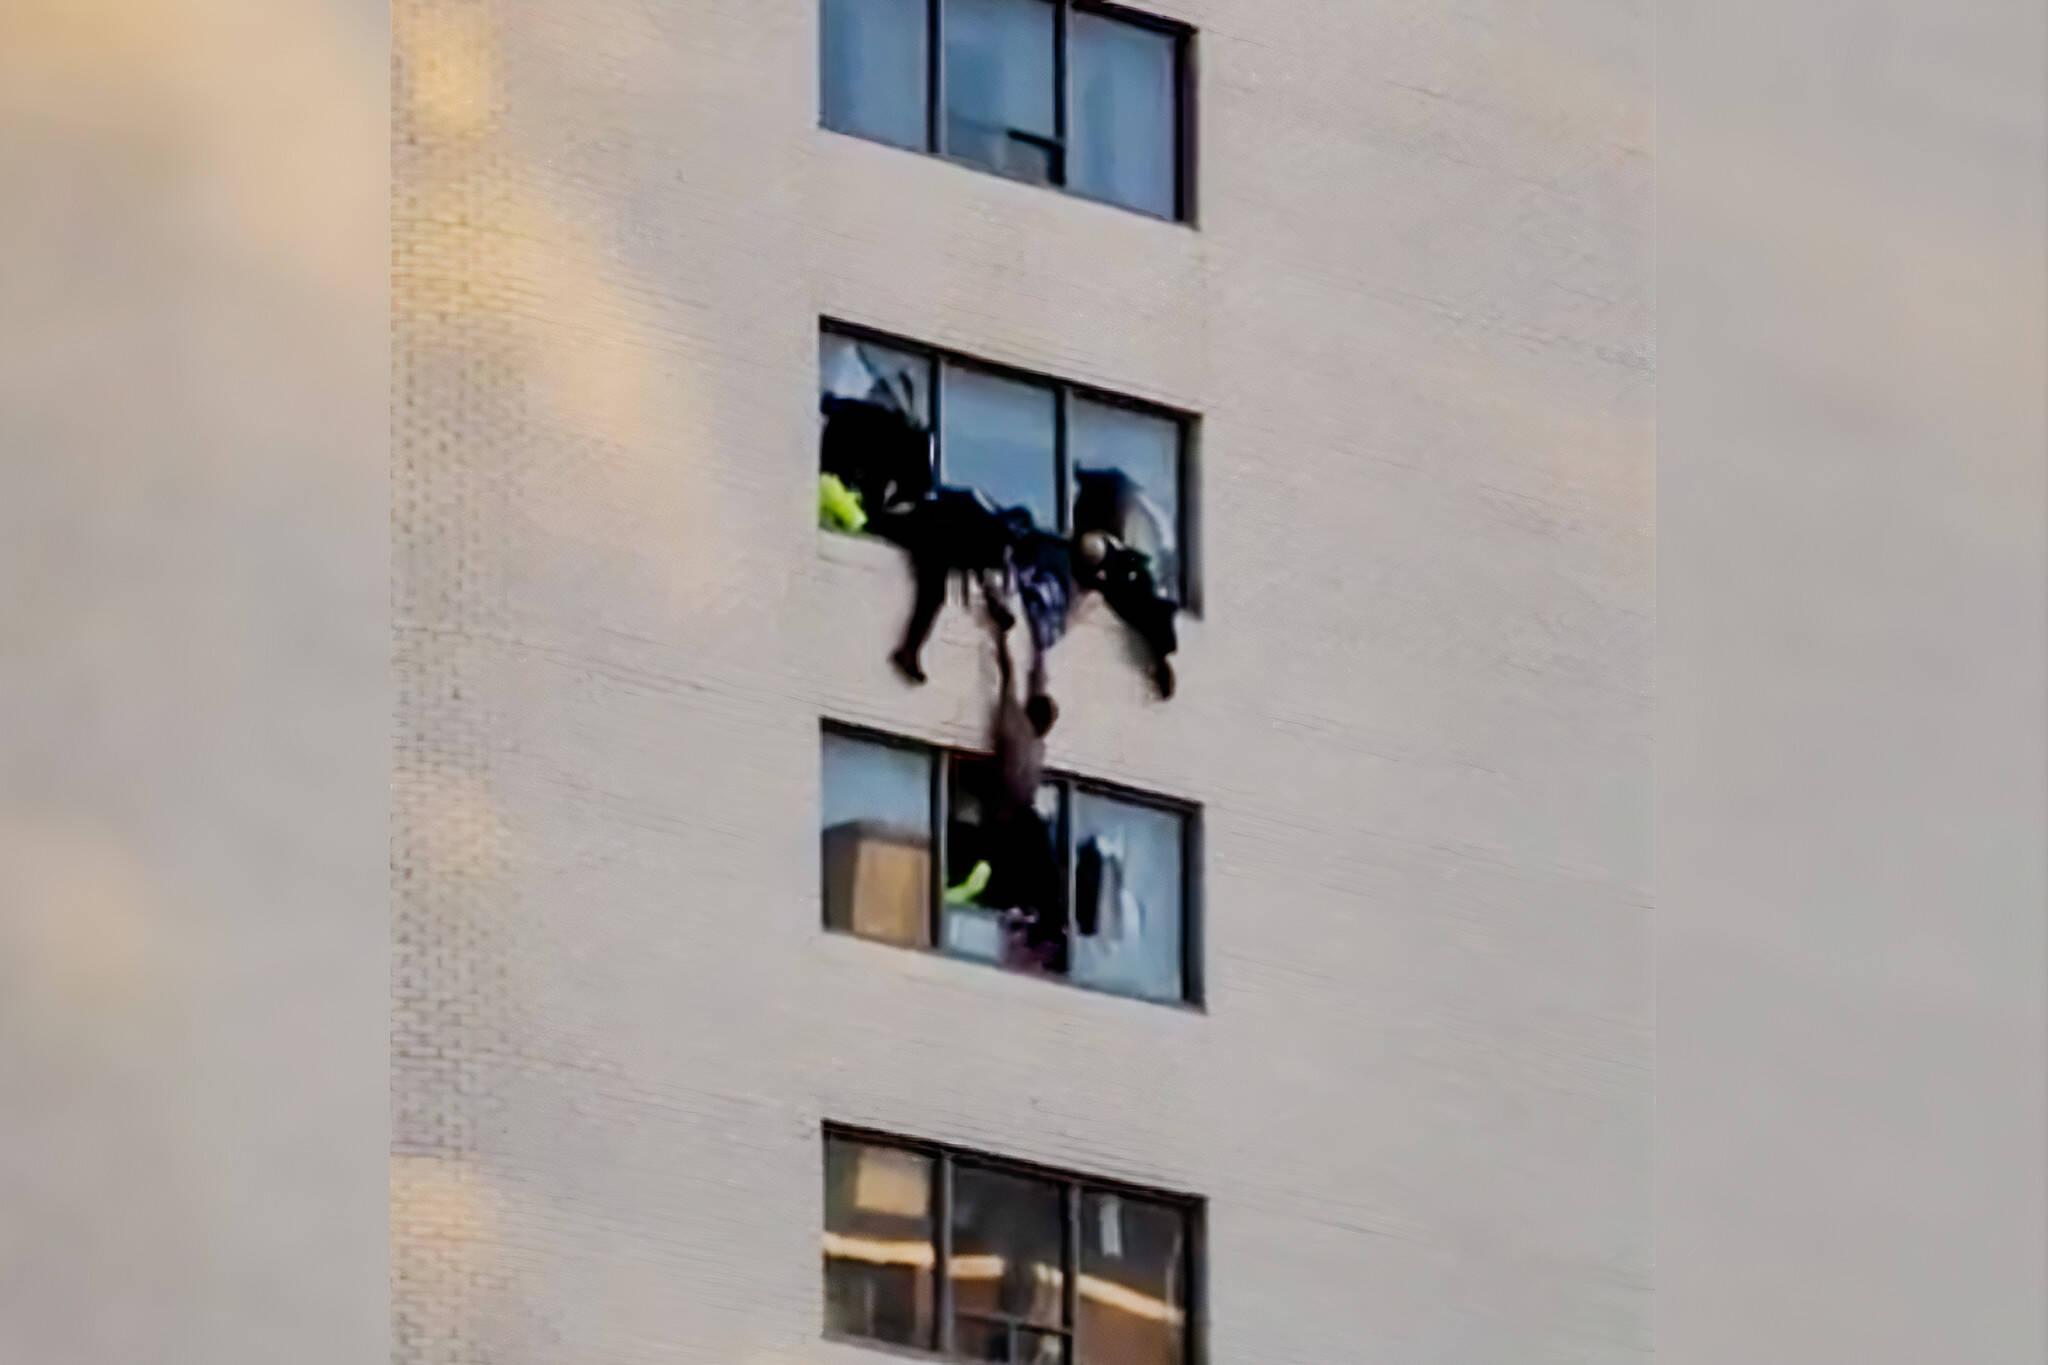 toronto police rescue